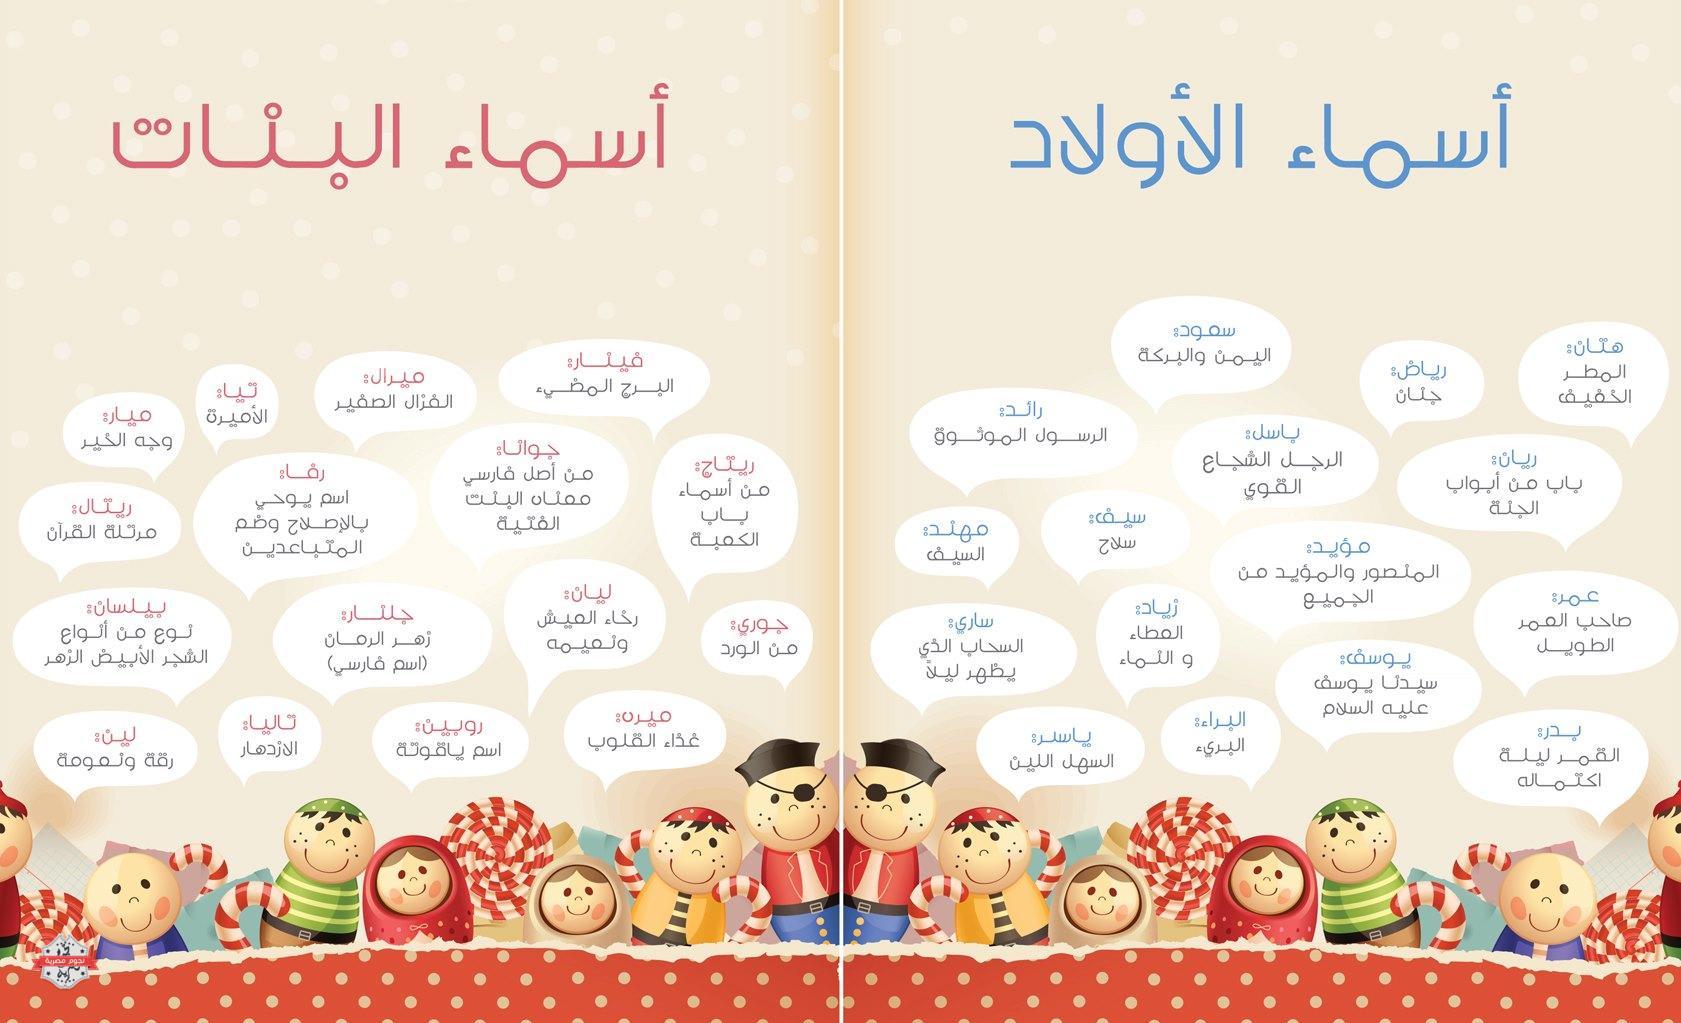 1d7c2491d اسماء اولاد 2019 , اجمل اسماء الاولاد الحديثة - حبيبي